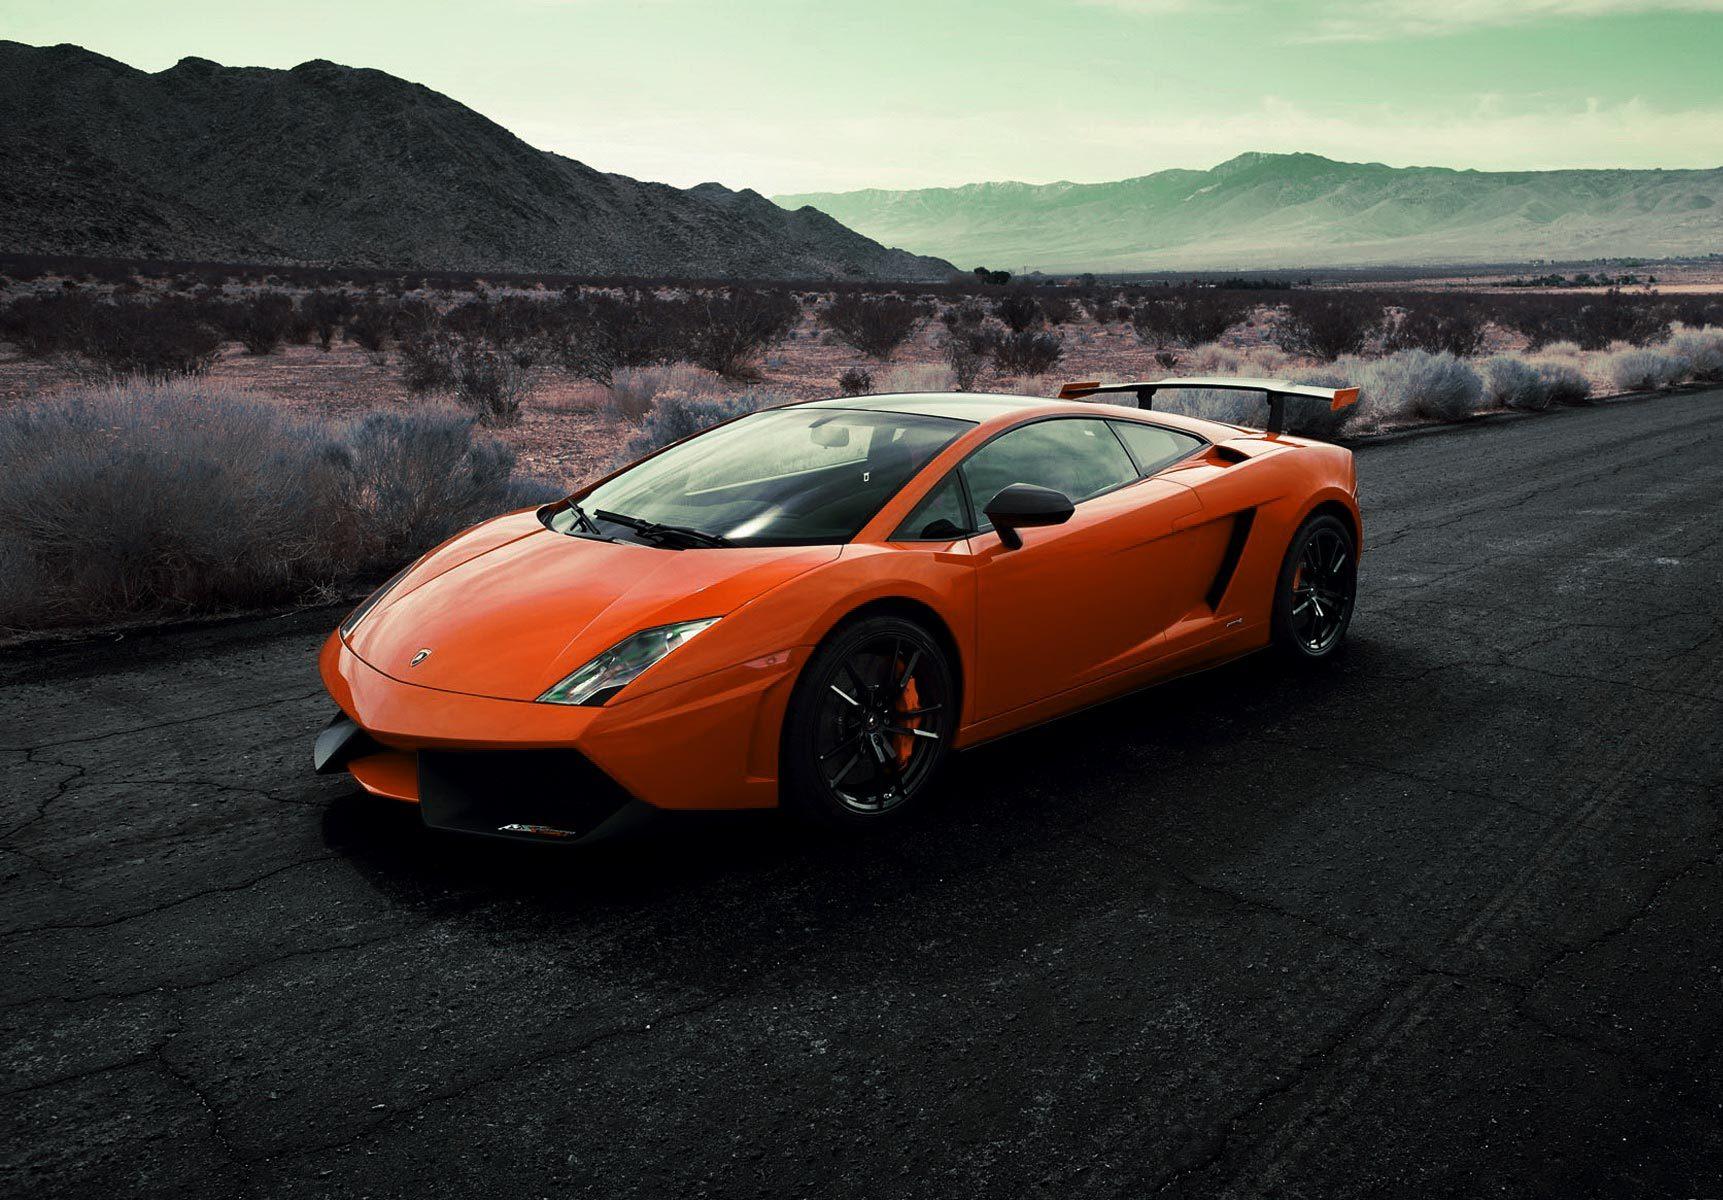 Imagenes De Un Lamborghini: Ruta 11km Lamborghini Gallardo » GTPASION.COM